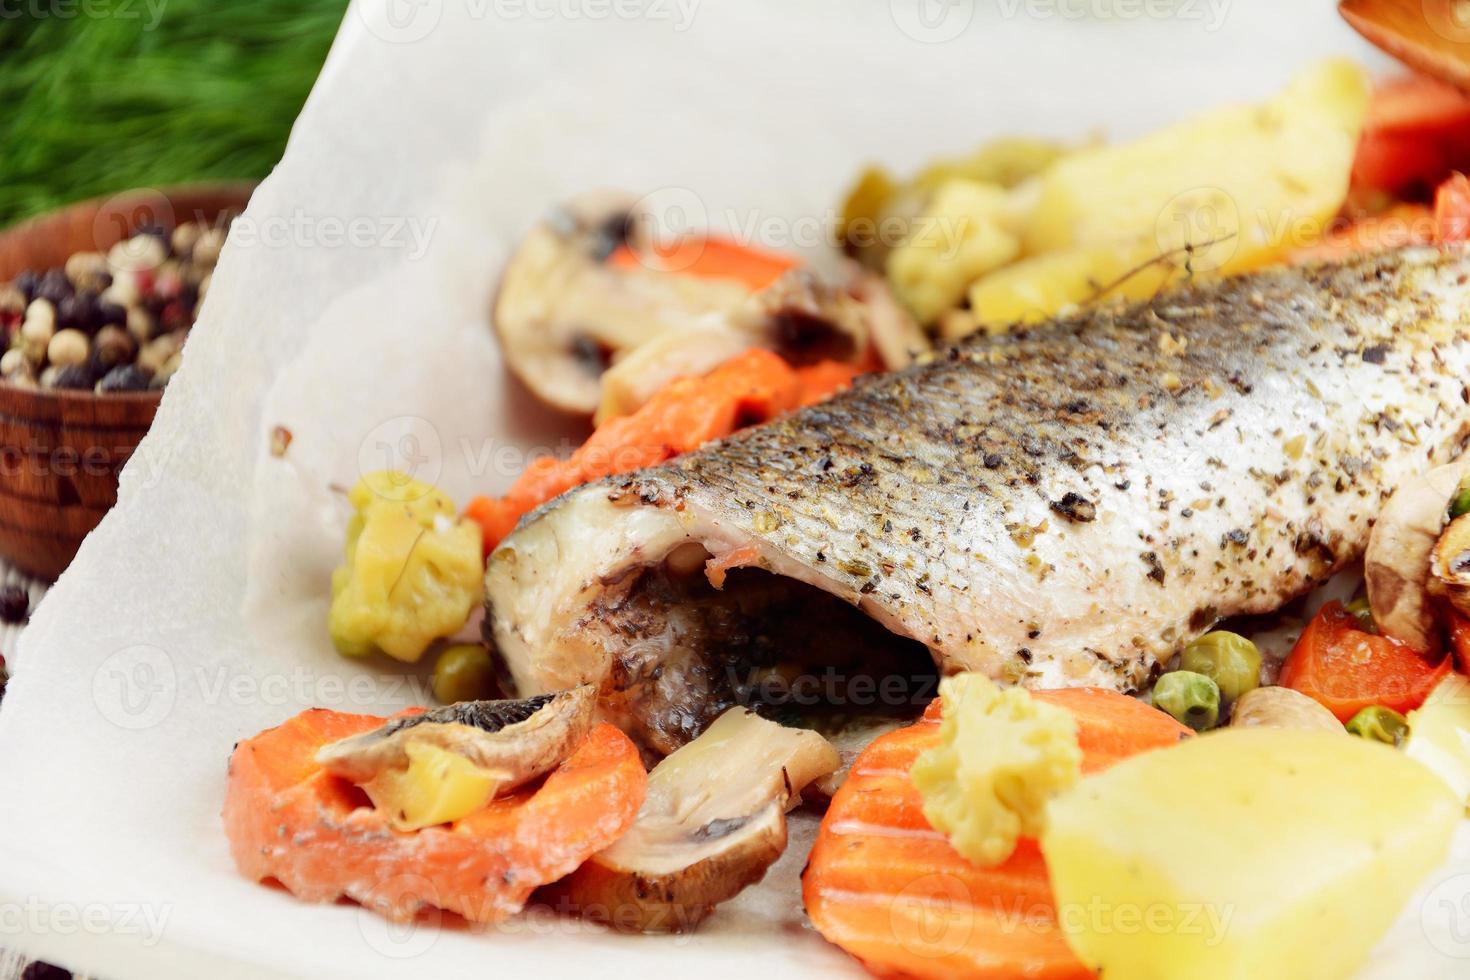 pescado de lubina al horno foto